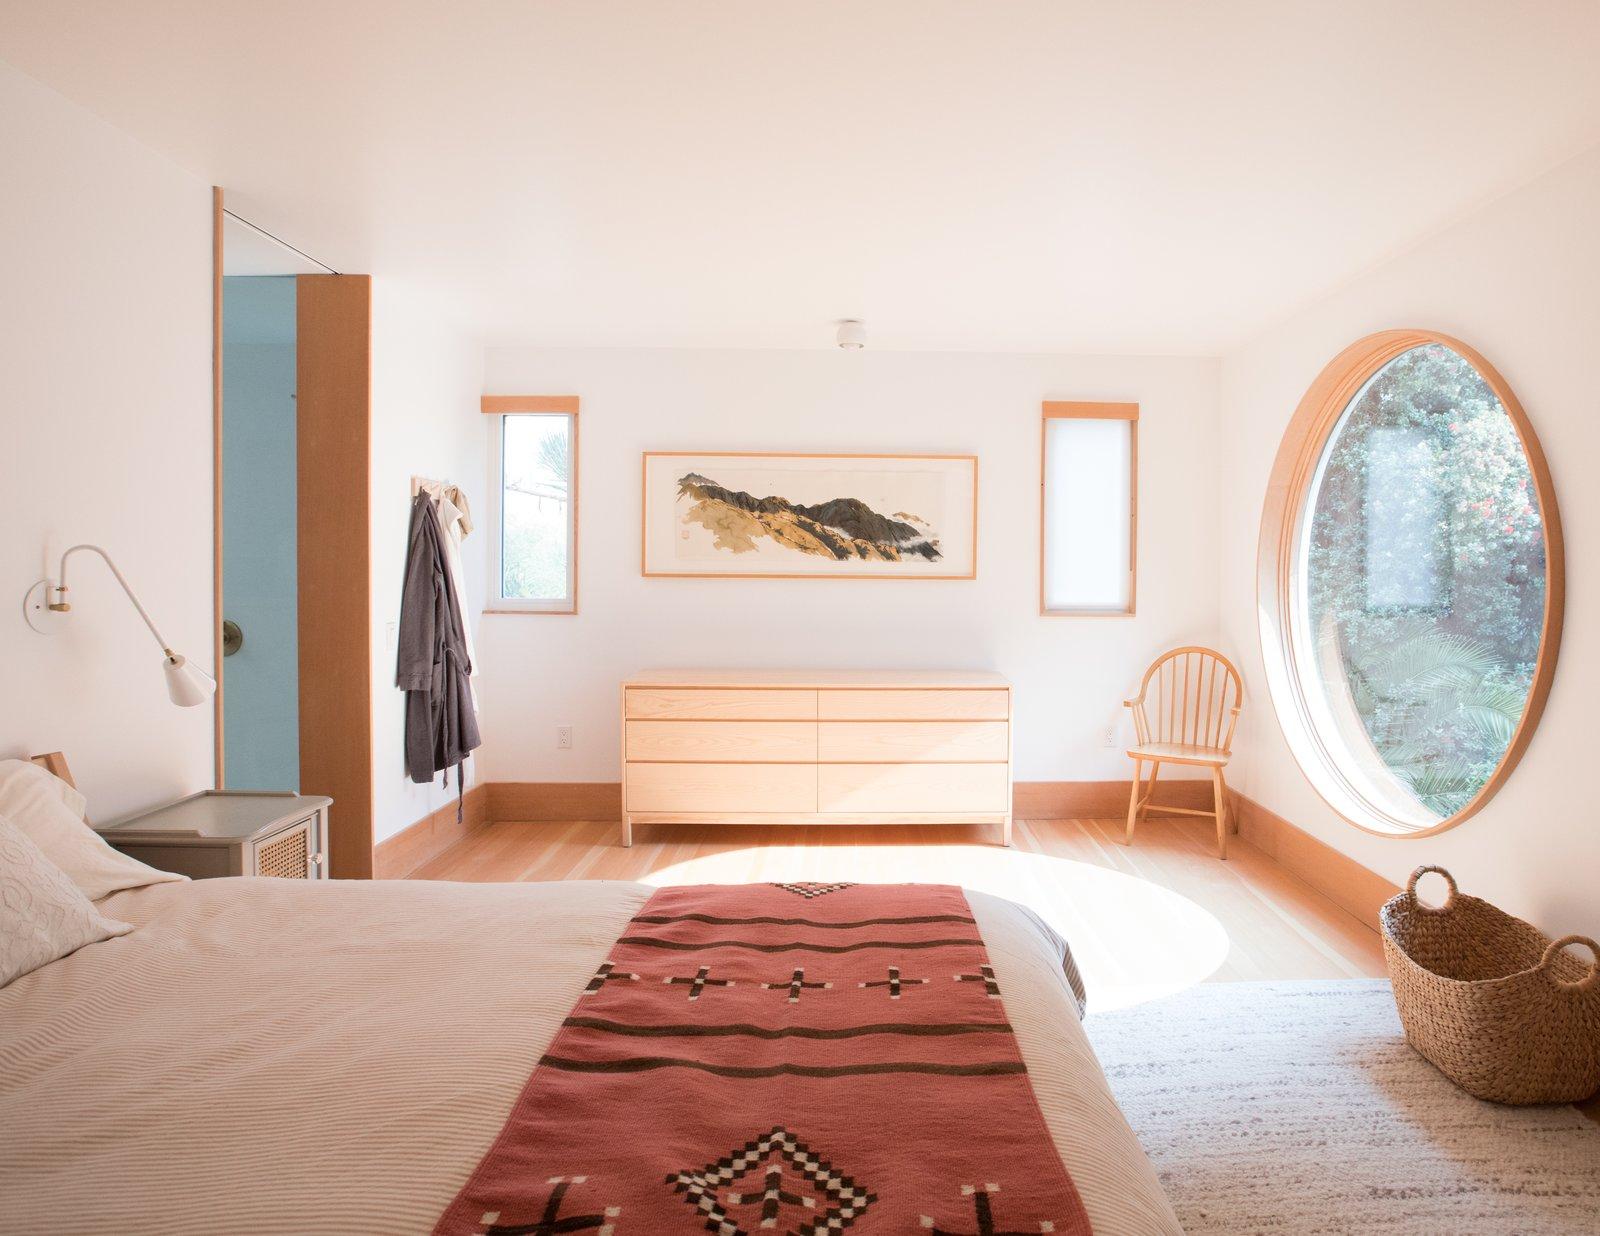 Carriage House by Medium Plenty bedroom with circular window